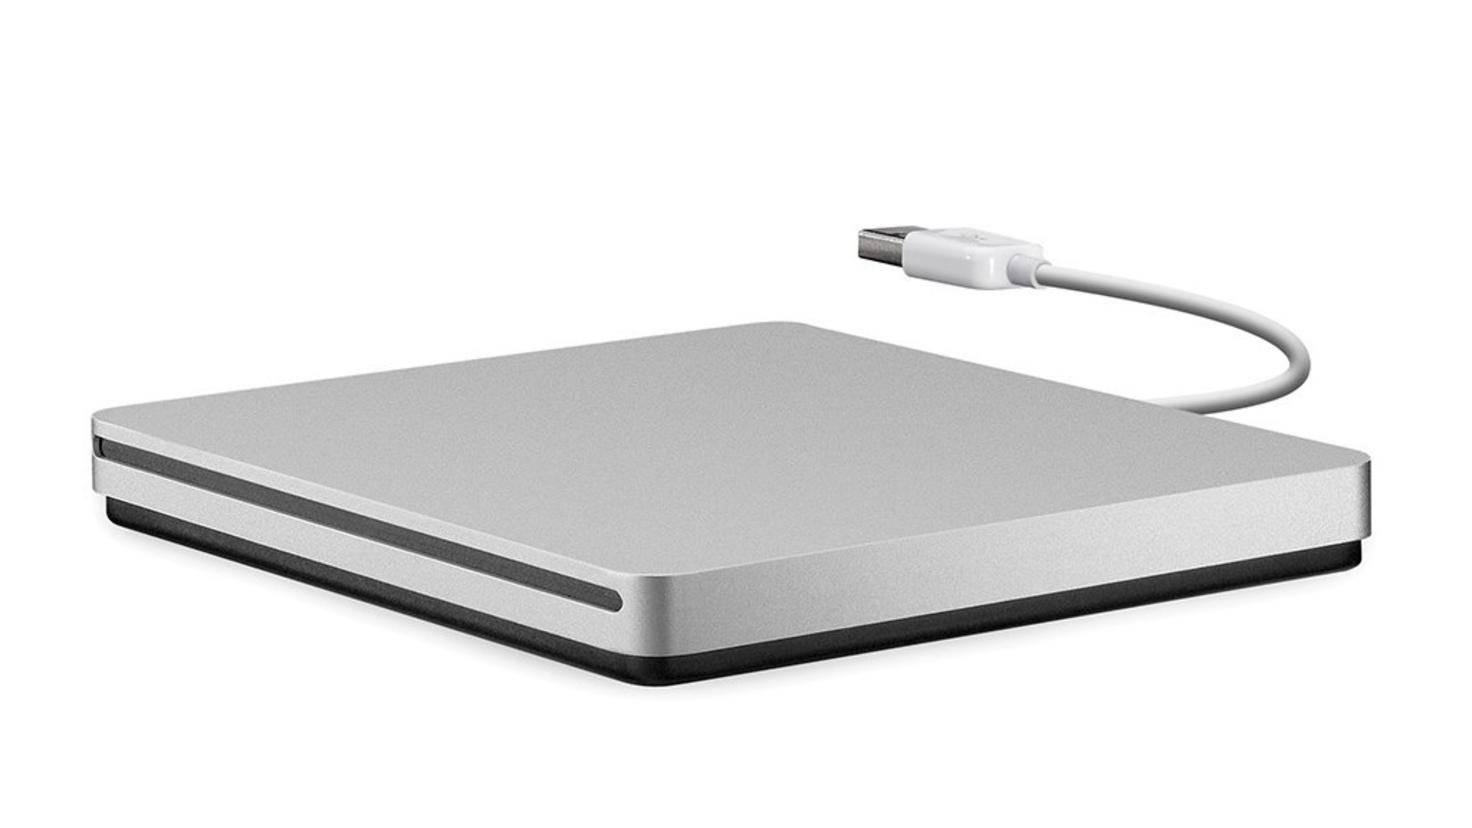 Apple-Superdrive